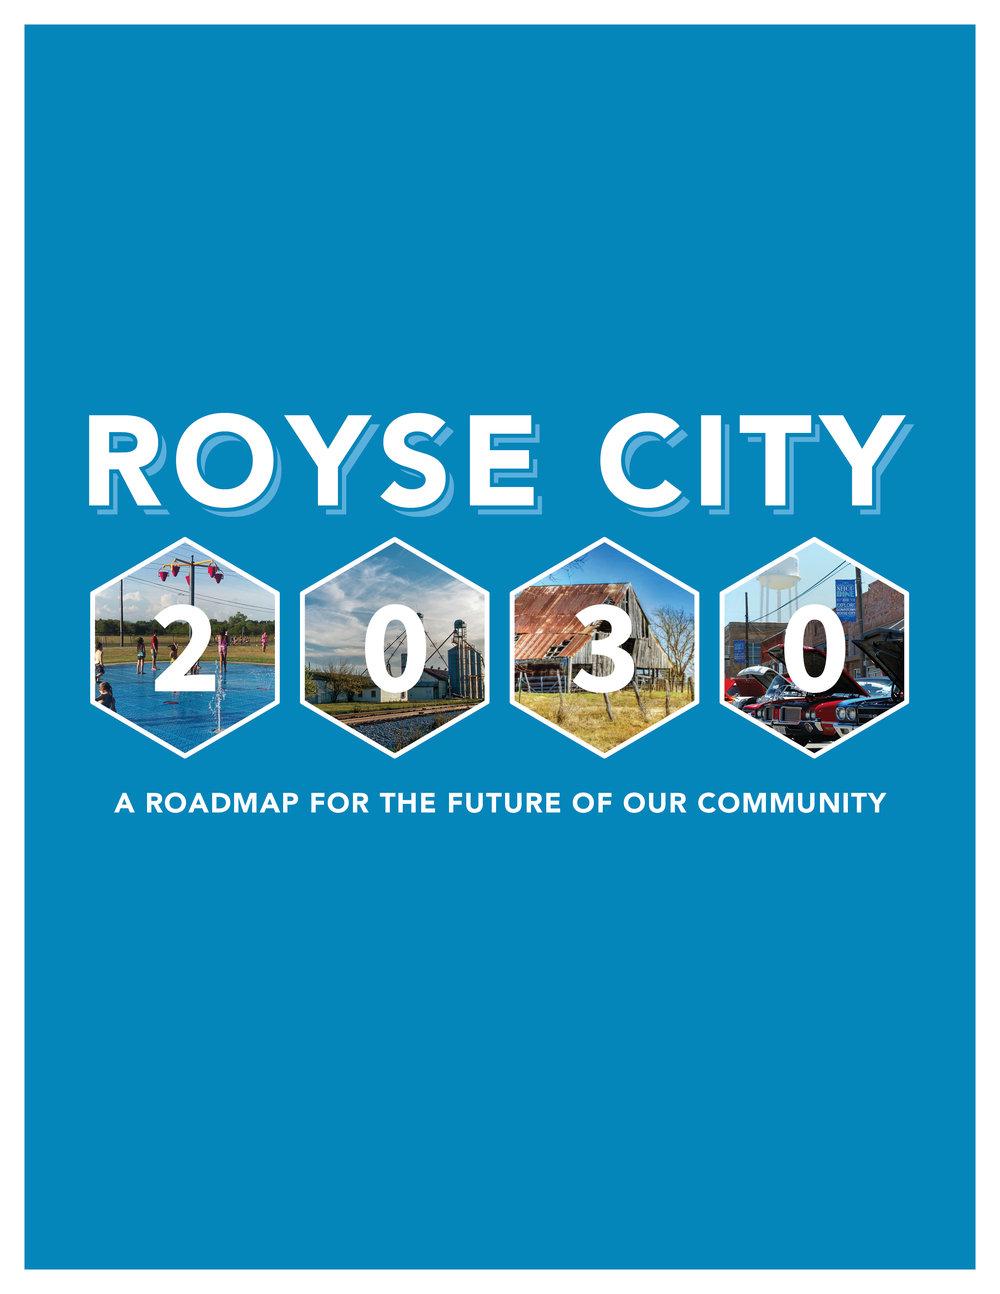 Royse City 2030 Cover.jpg